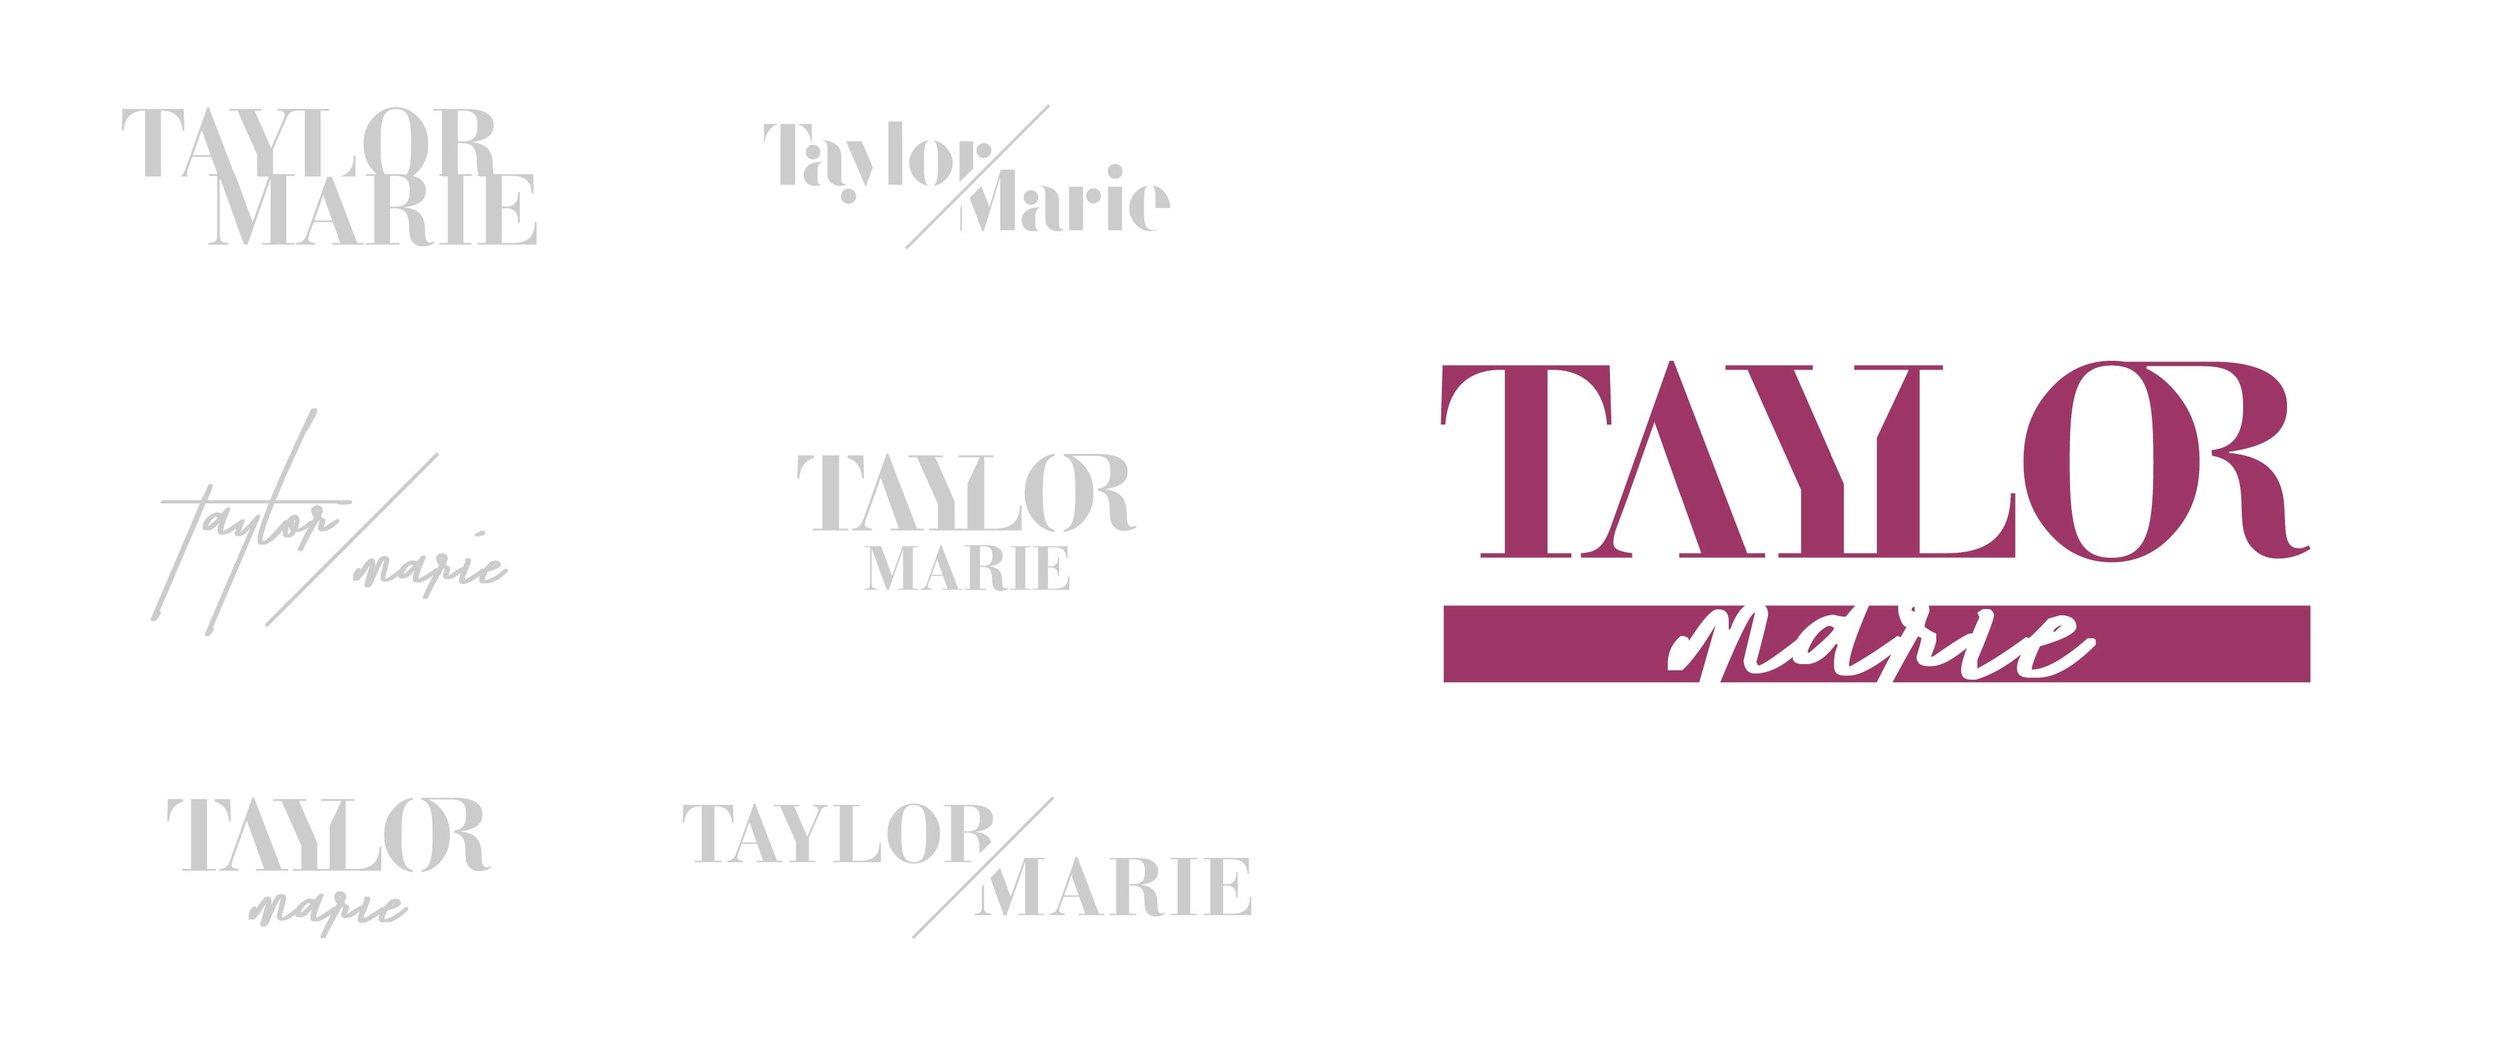 nicole-mata_taylormarie-logo-03.jpg